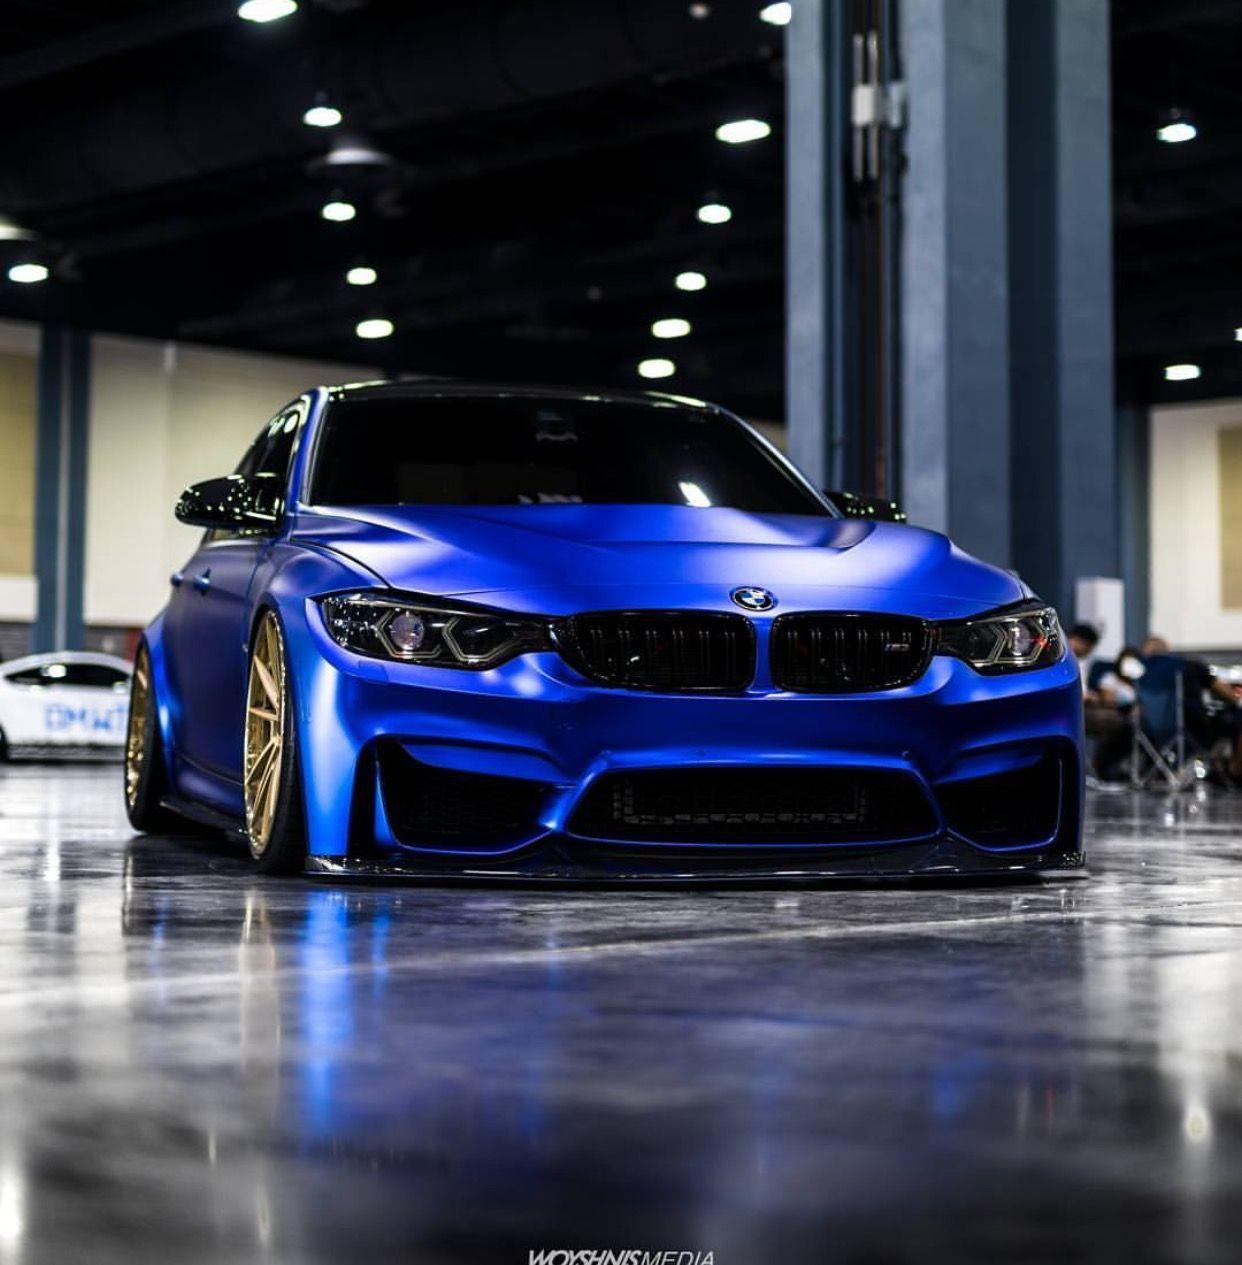 ℛℰ i ℕnℰd by averson automotive group llc blue bmw bmw car bmw m3 pinterest